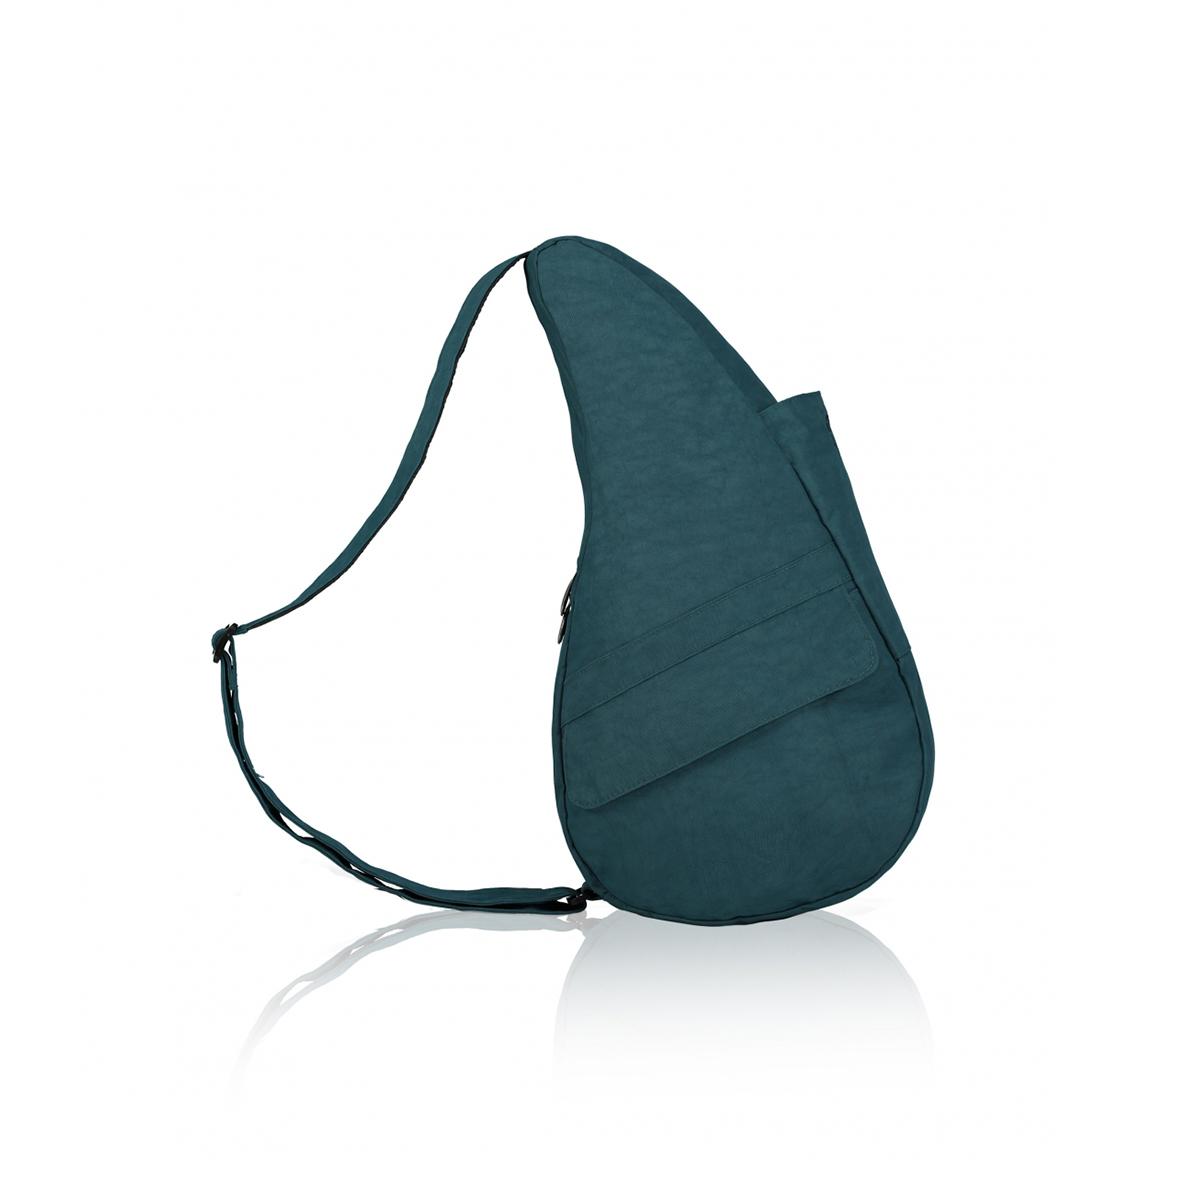 Healthy Back Bag/ヘルシーバックバッグ/ショルダーバッグ/ボディバッグ/旅行バッグ/軽量/レディース/メンズ 《限定ポーチ付》 公式ストア ヘルシーバックバッグ テクスチャードナイロン Sサイズ ラグーン